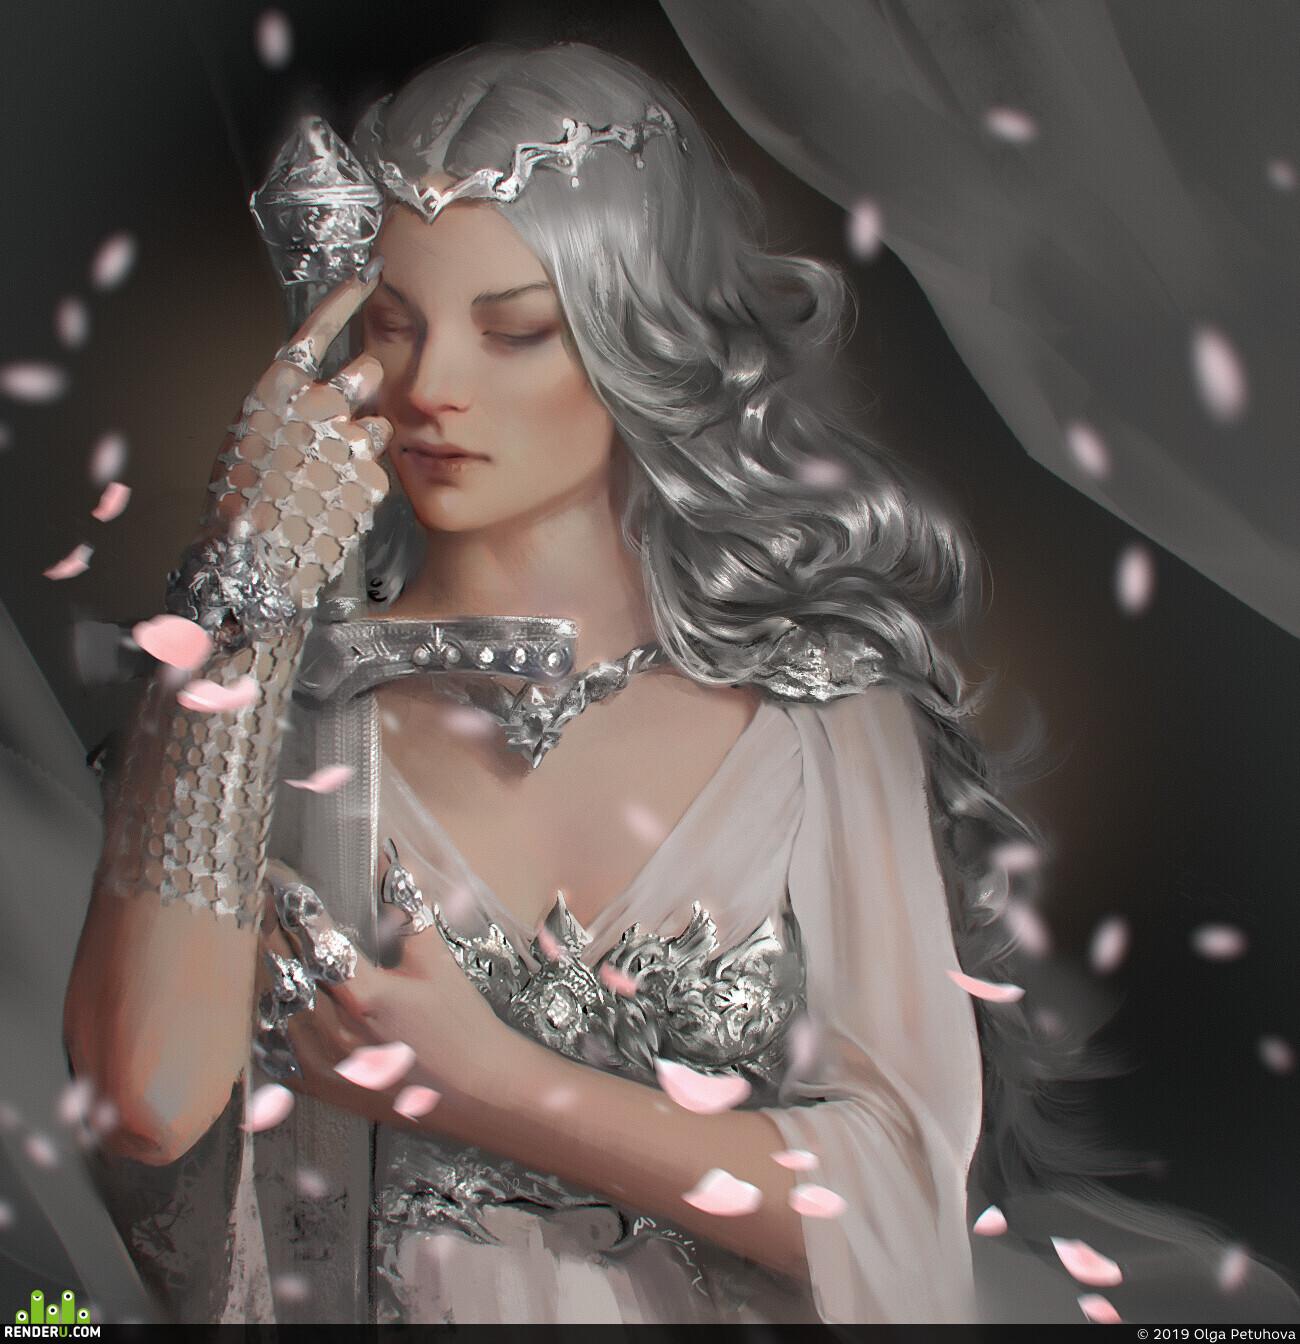 Character, Fantasy, woman, sword